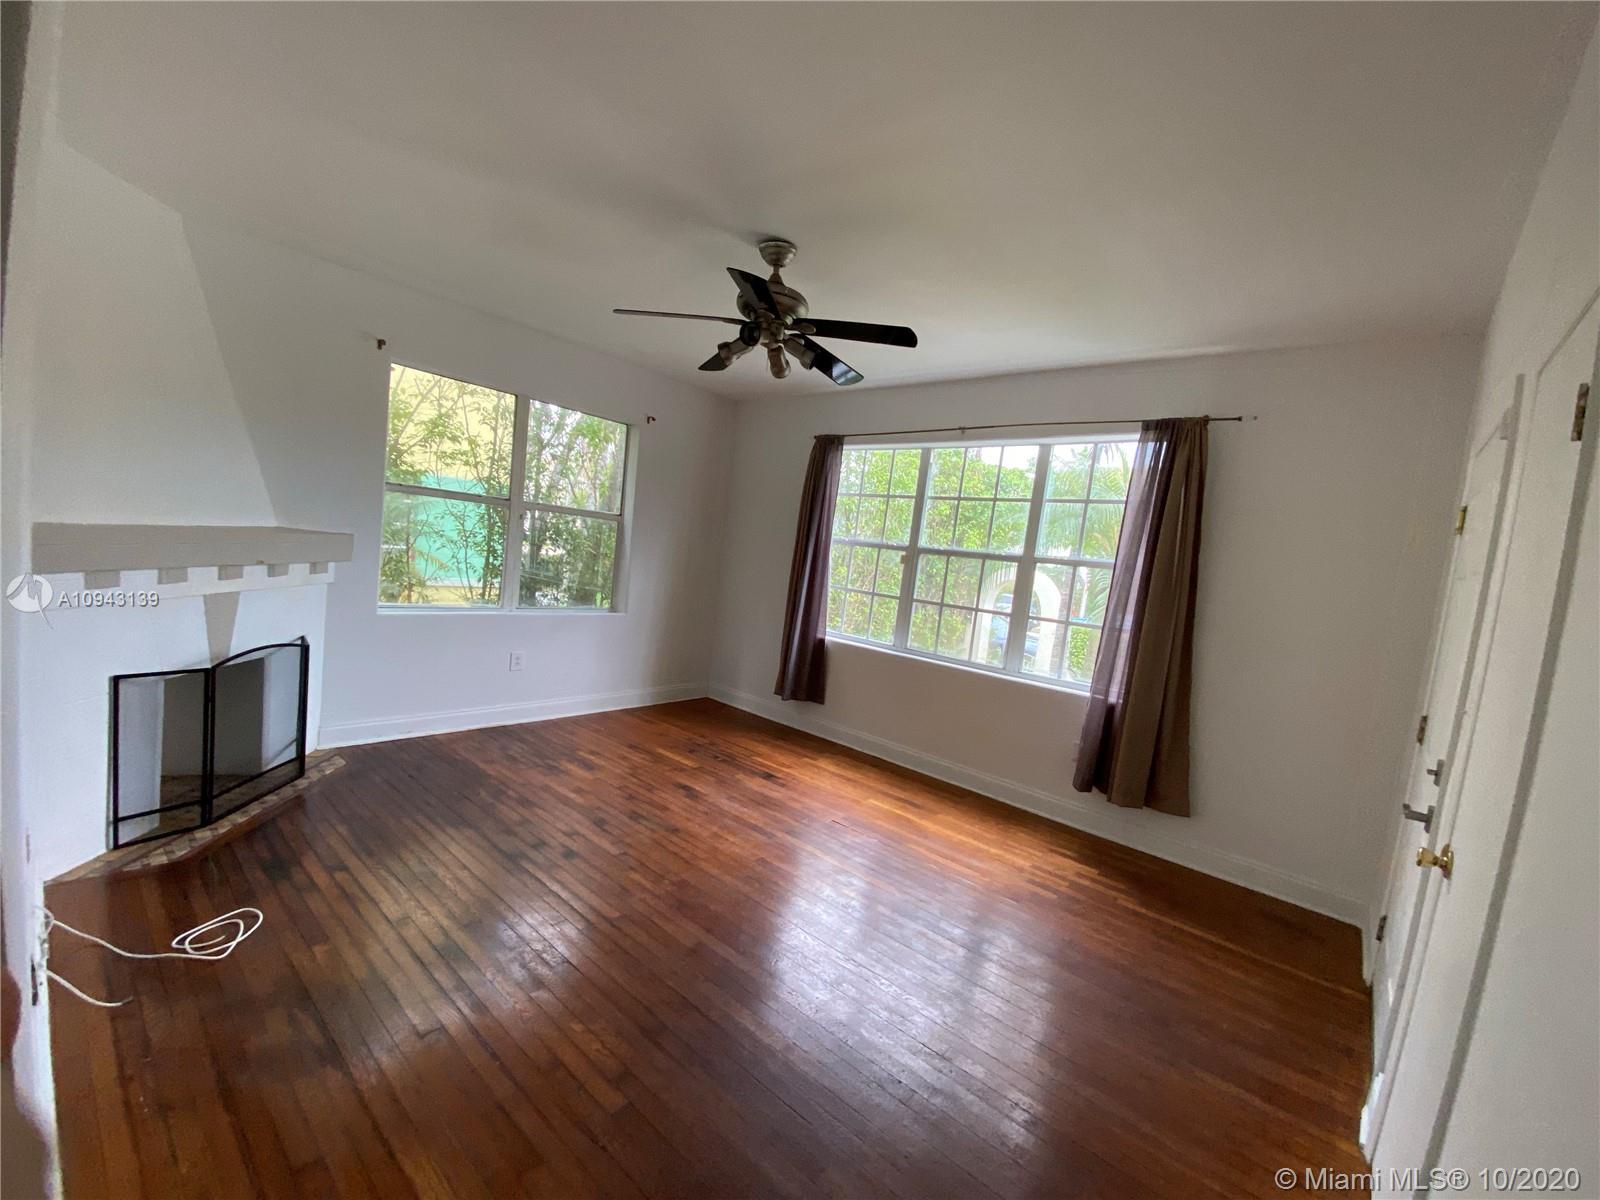 1027 Euclid Ave, Unit #1 Luxury Real Estate